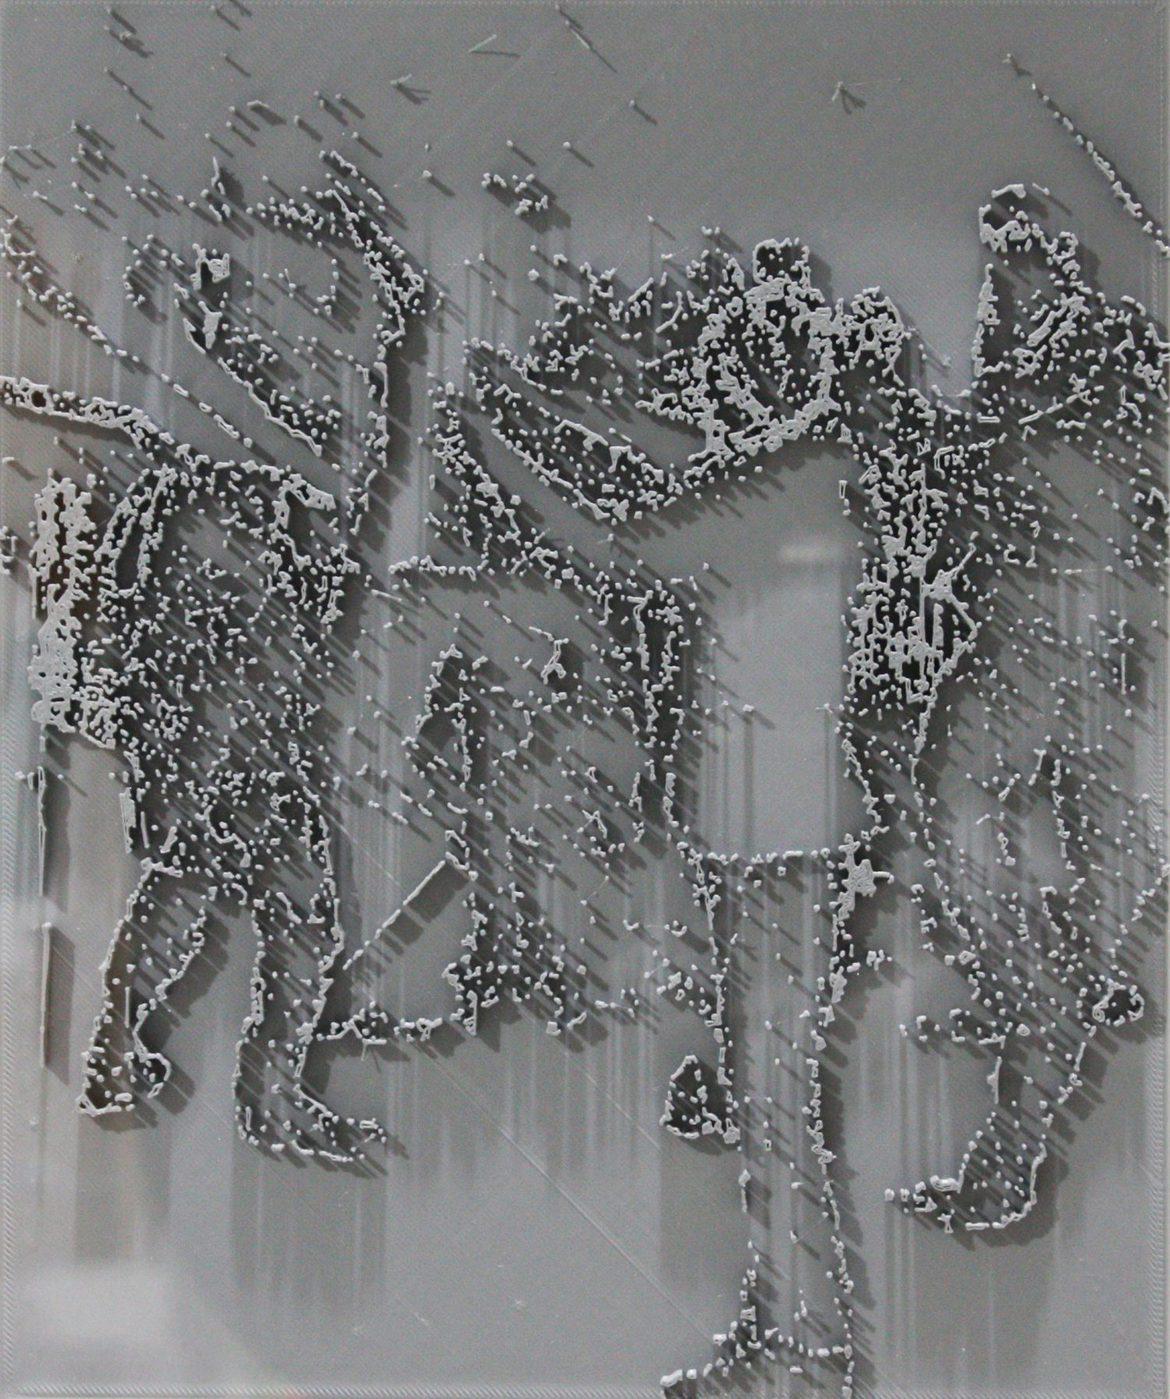 Jon Cattapan, 'Vapour Study II', 2019, 3D print, framed, 37 x 44 cm, edition of 5 + 1 A.P